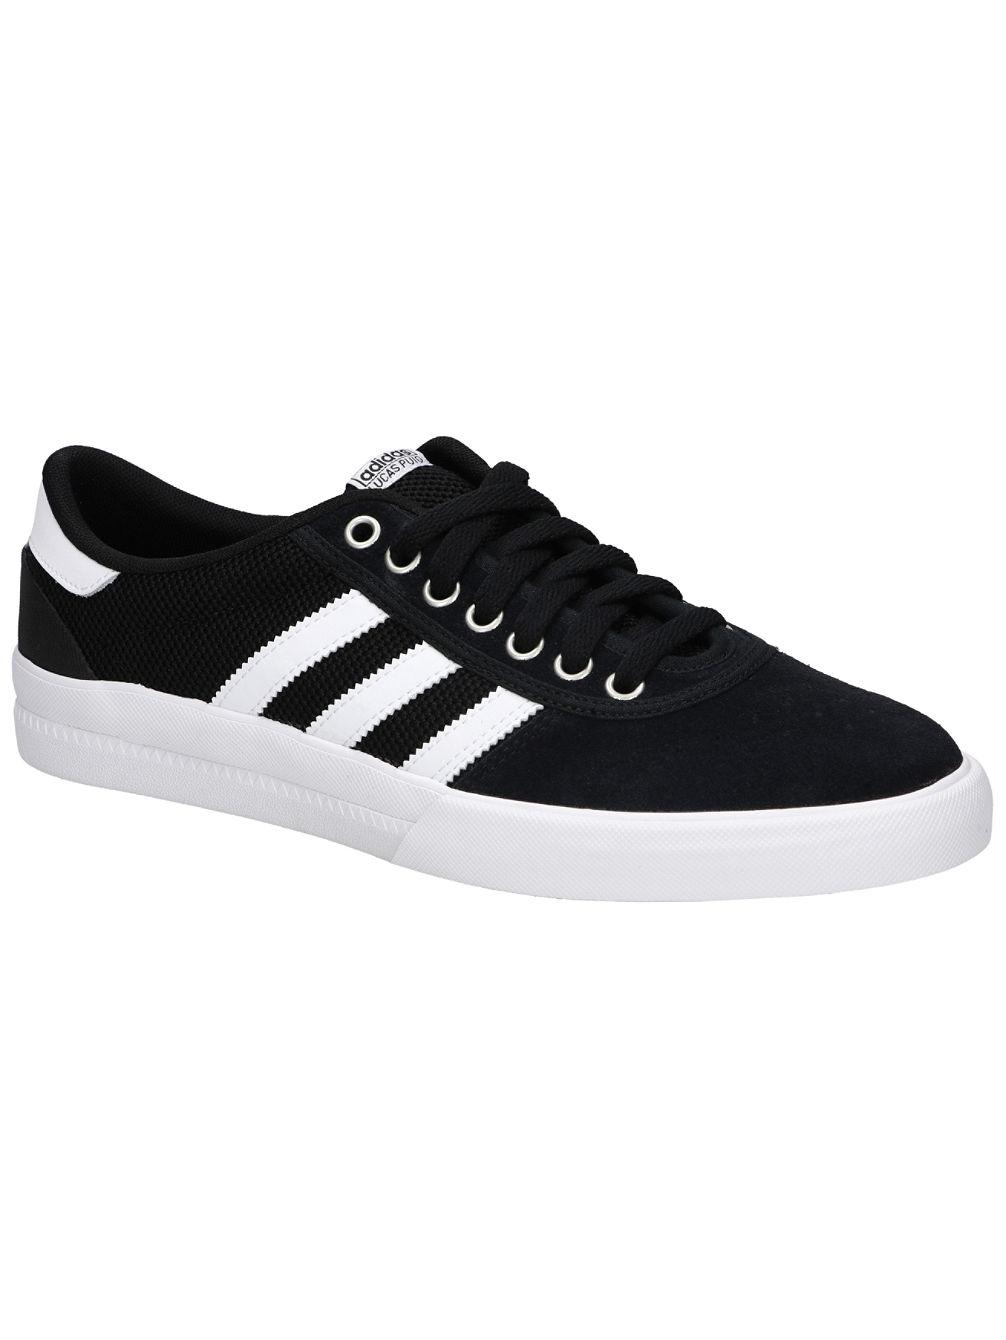 quality design 0fd4c 1ae7c Buy adidas Skateboarding Lucas Premiere Skate Shoes CoreblaFtwrWhit online  at blue-tomato.com